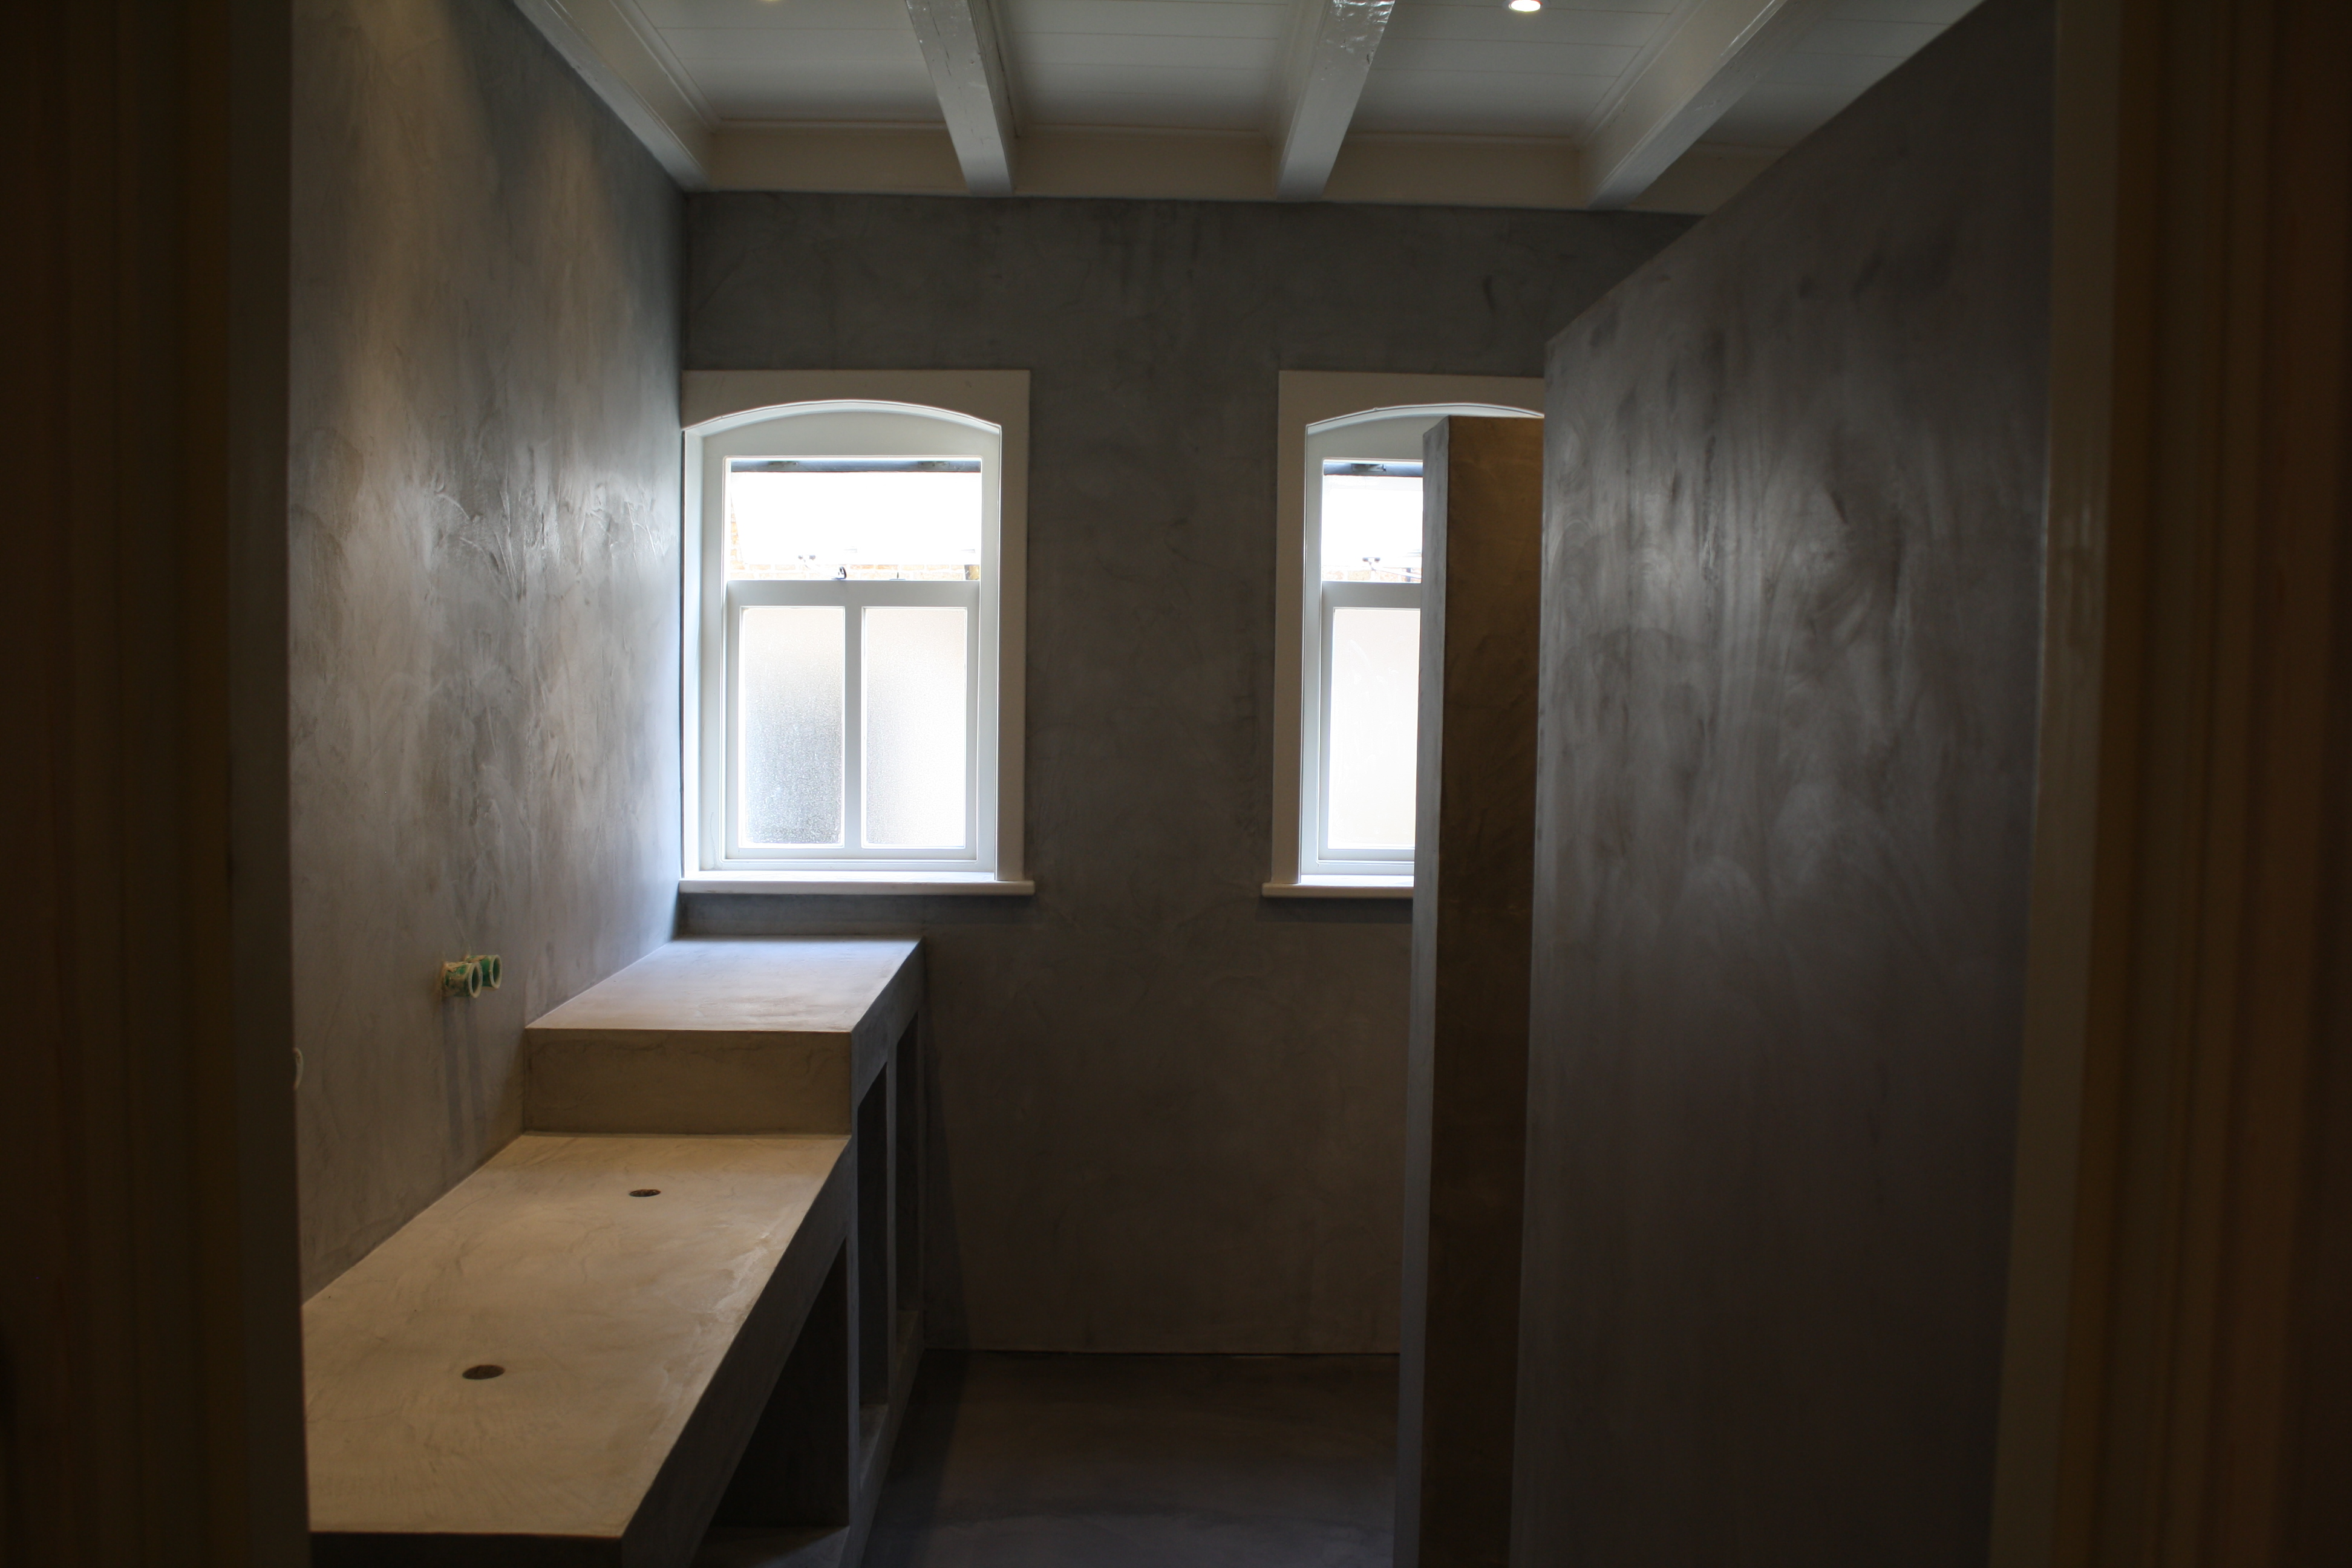 Mortex Badkamer Onderhoud : Mortex vloer image may contain people sitting table and indoor